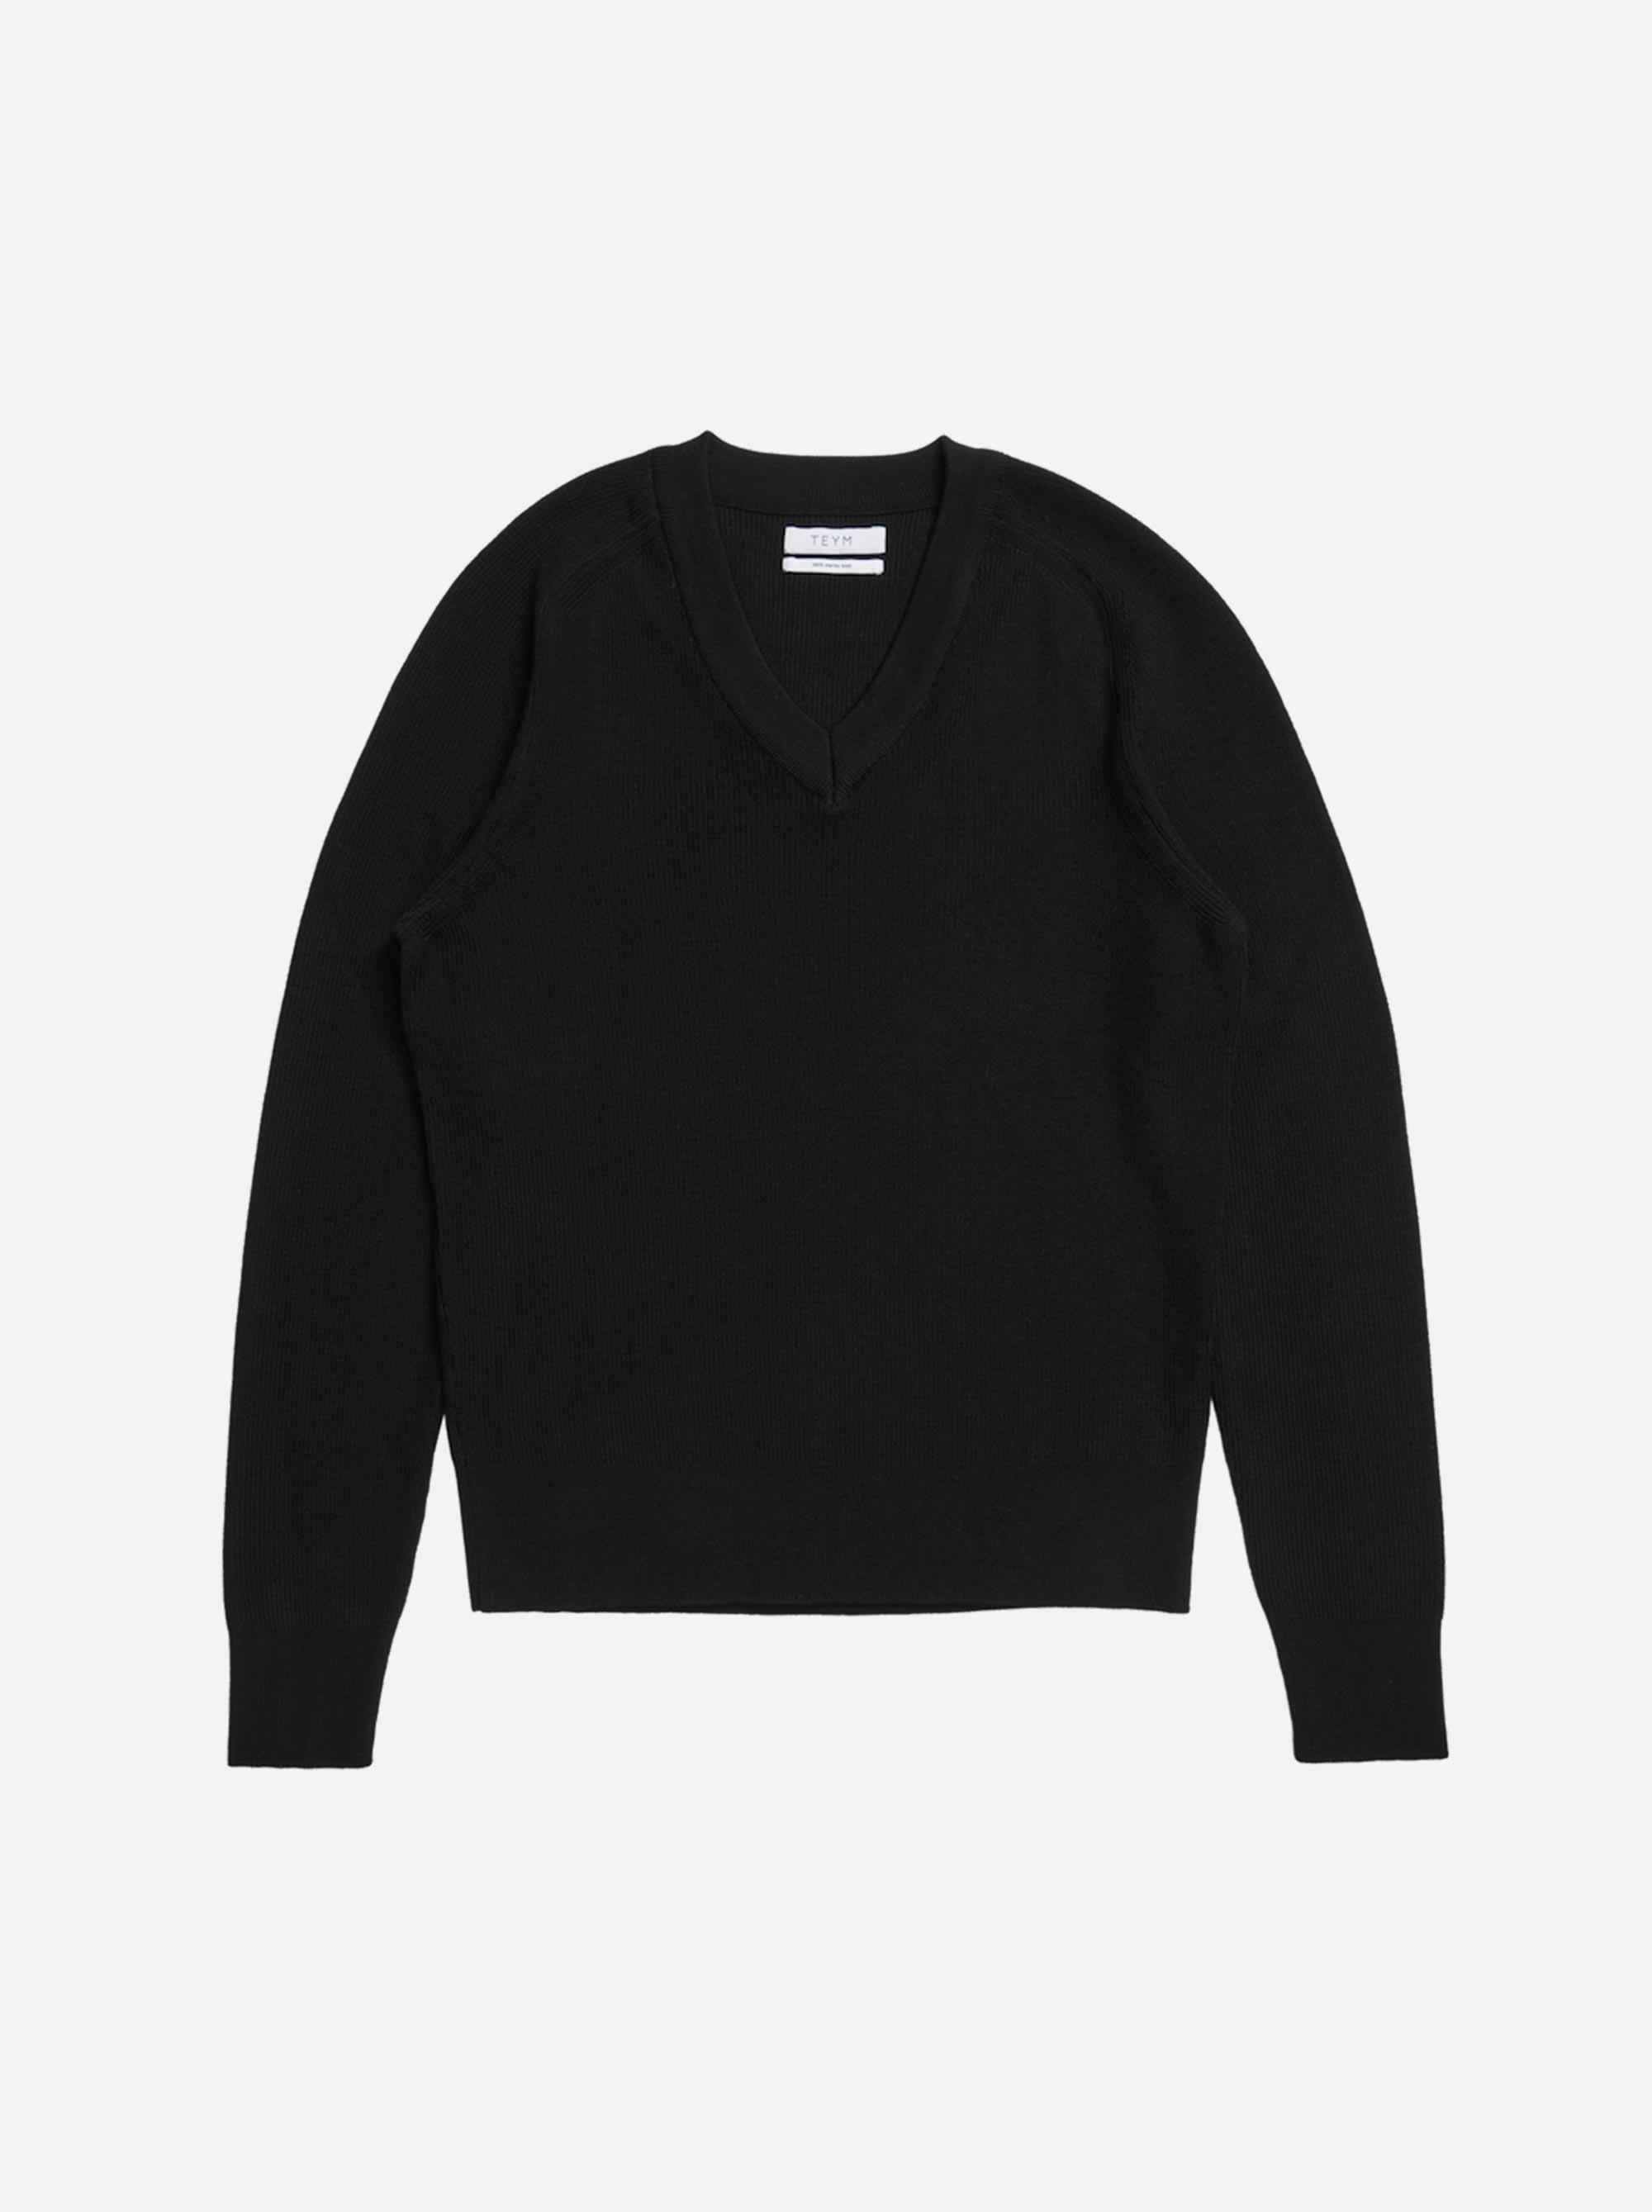 Teym - V-Neck - The Merino Sweater - Men - Black - 4